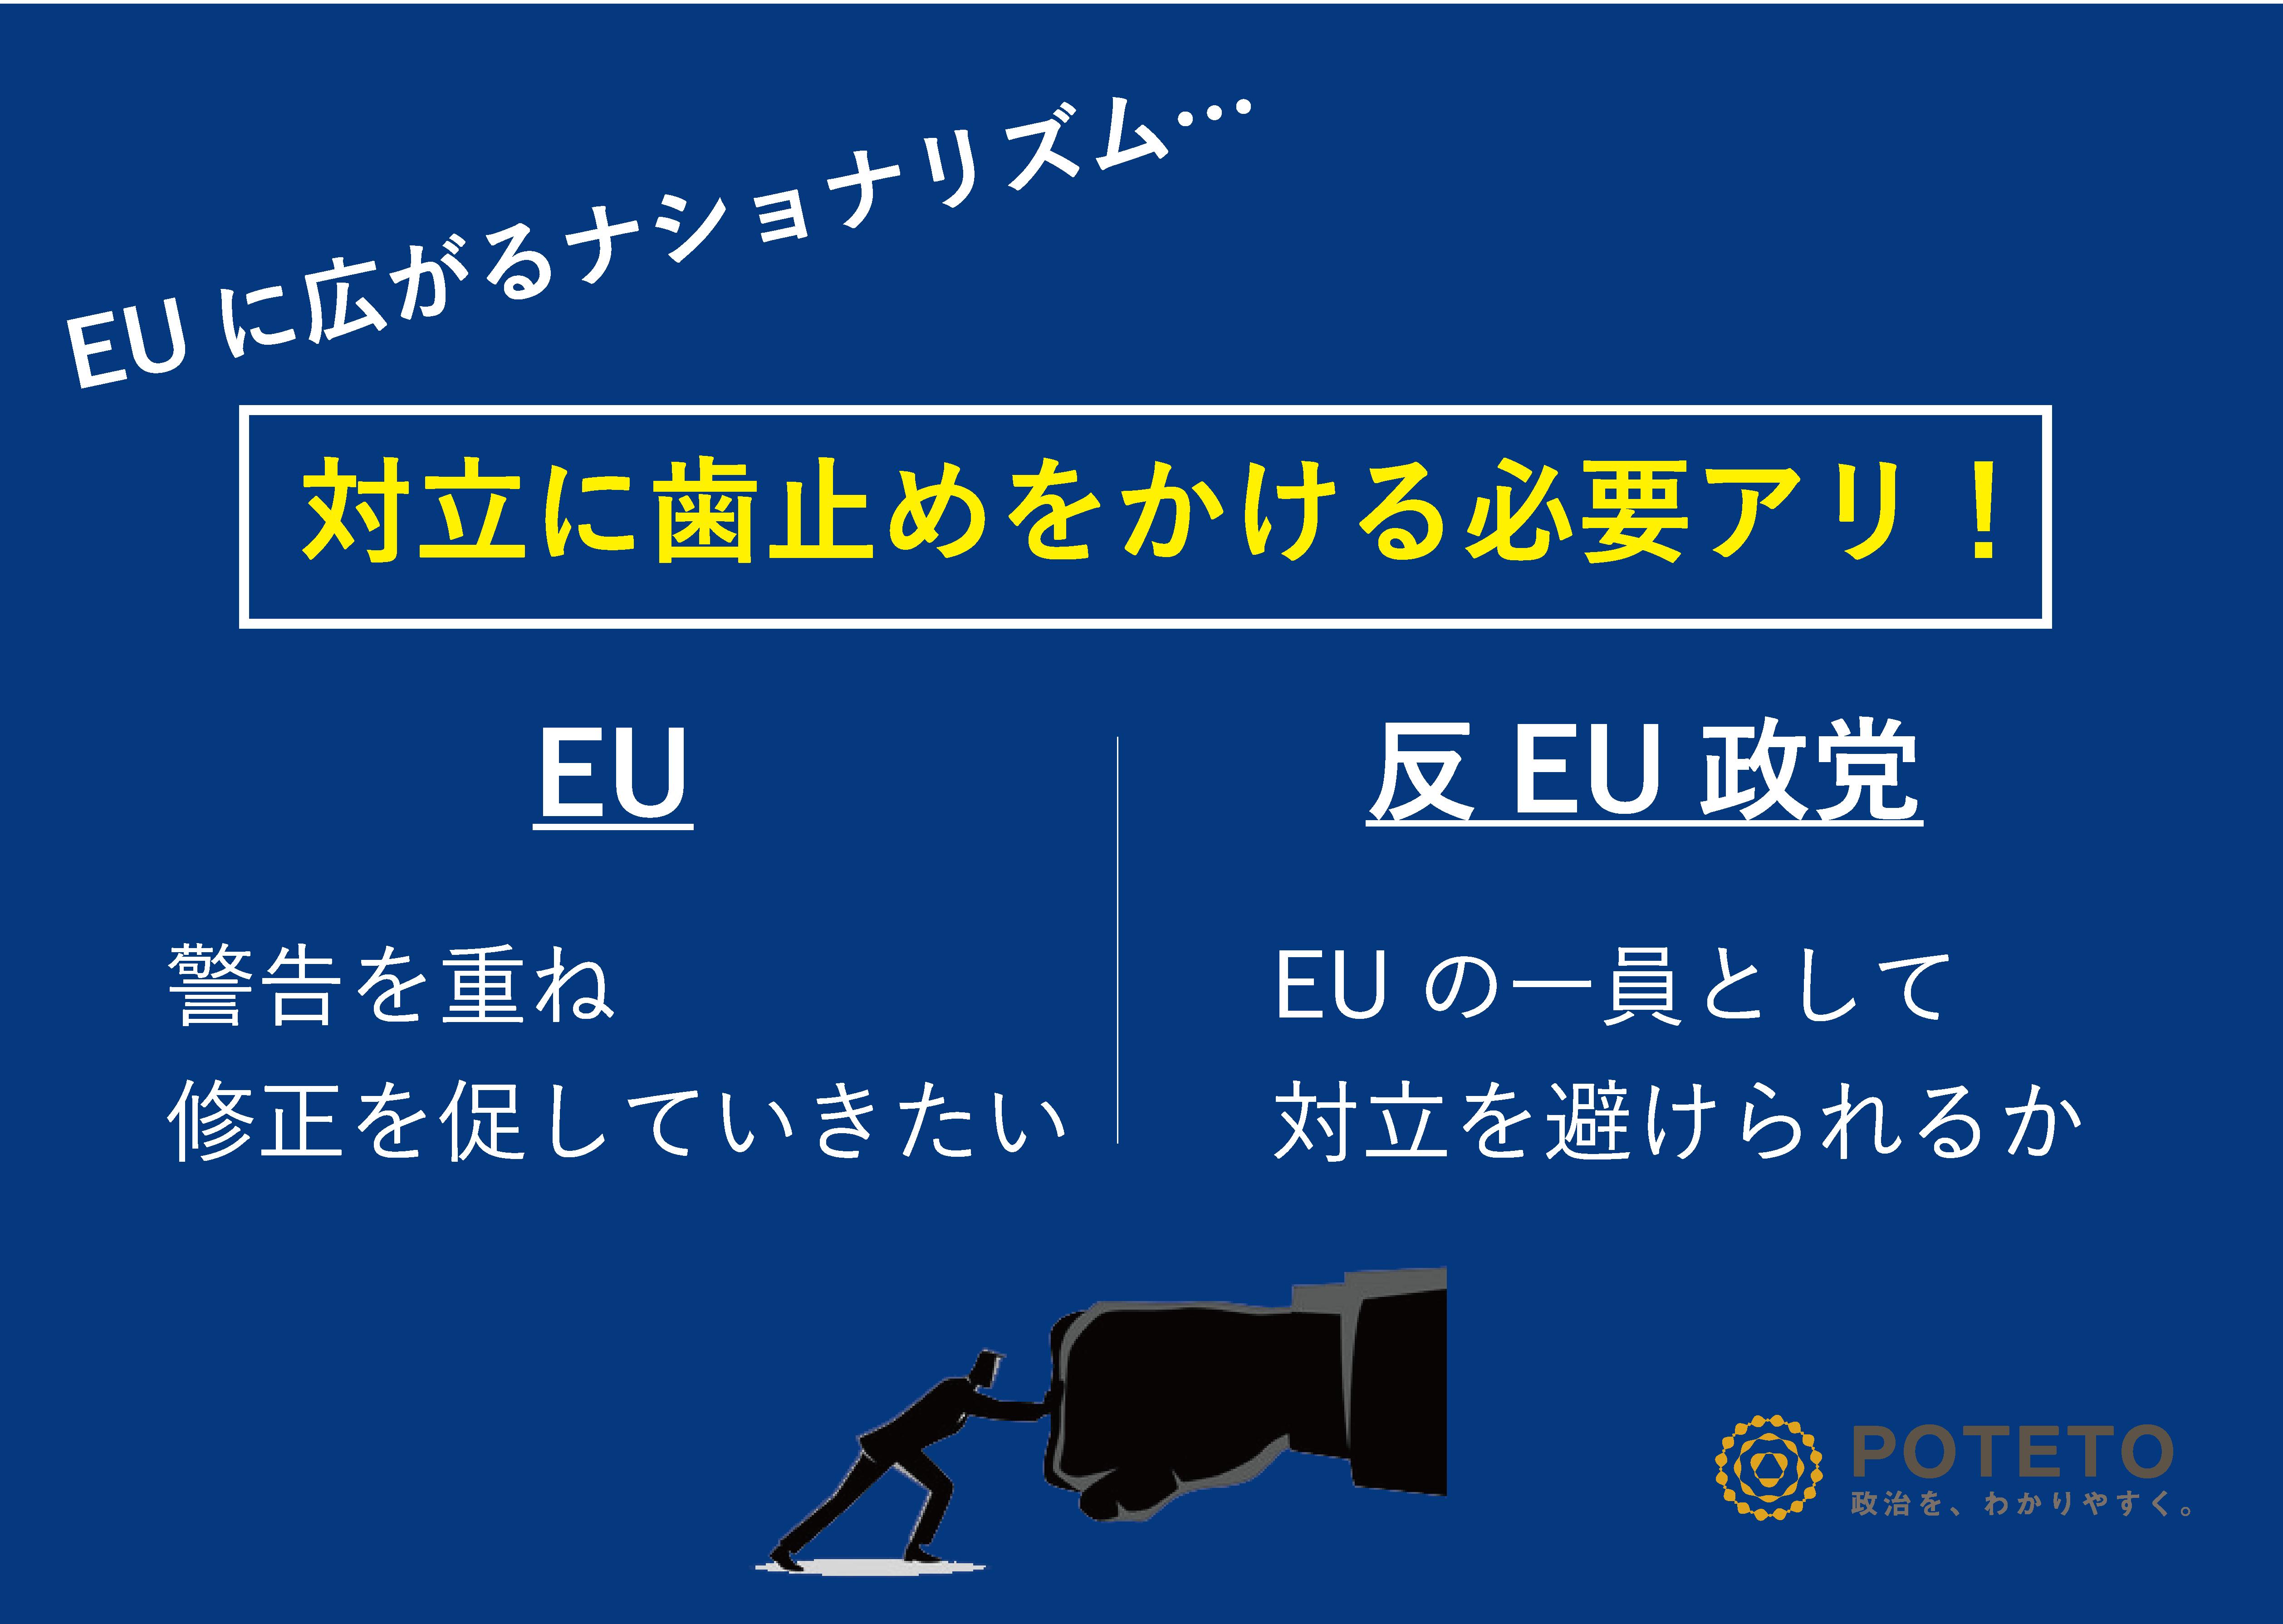 7c763cf9ea41337796f798921014cf99 - EUに広がる「反EU」「反移民」の波